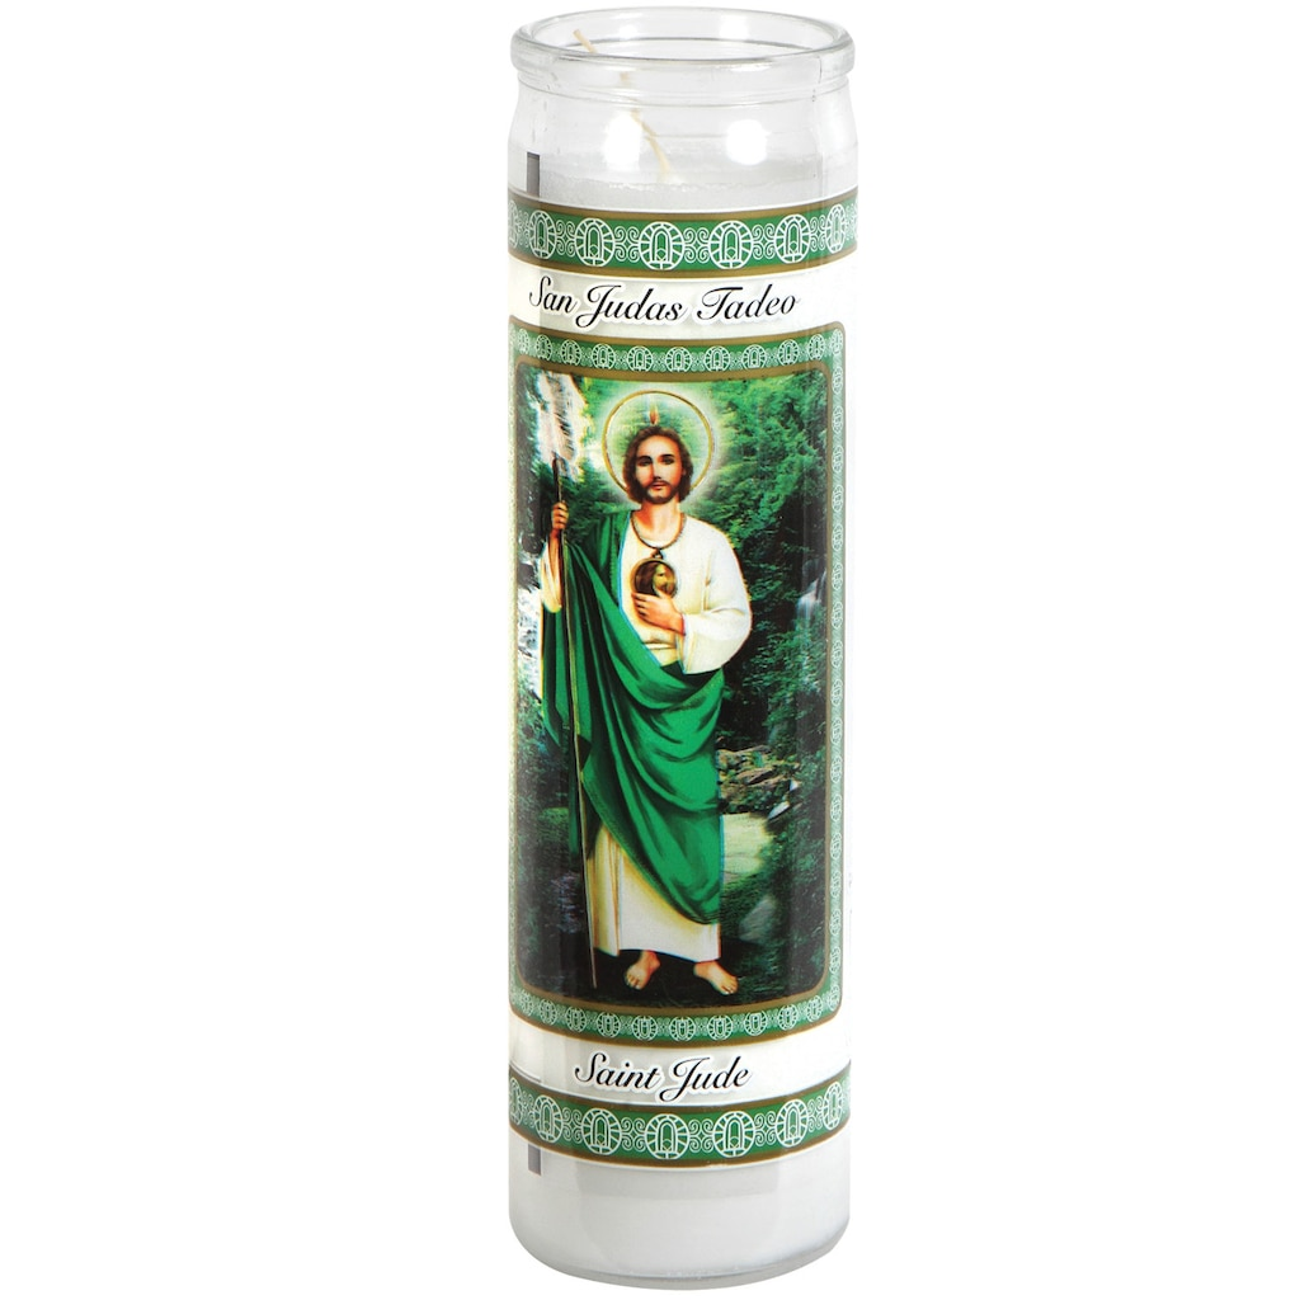 St Jude Candles Dollar Tree Inc